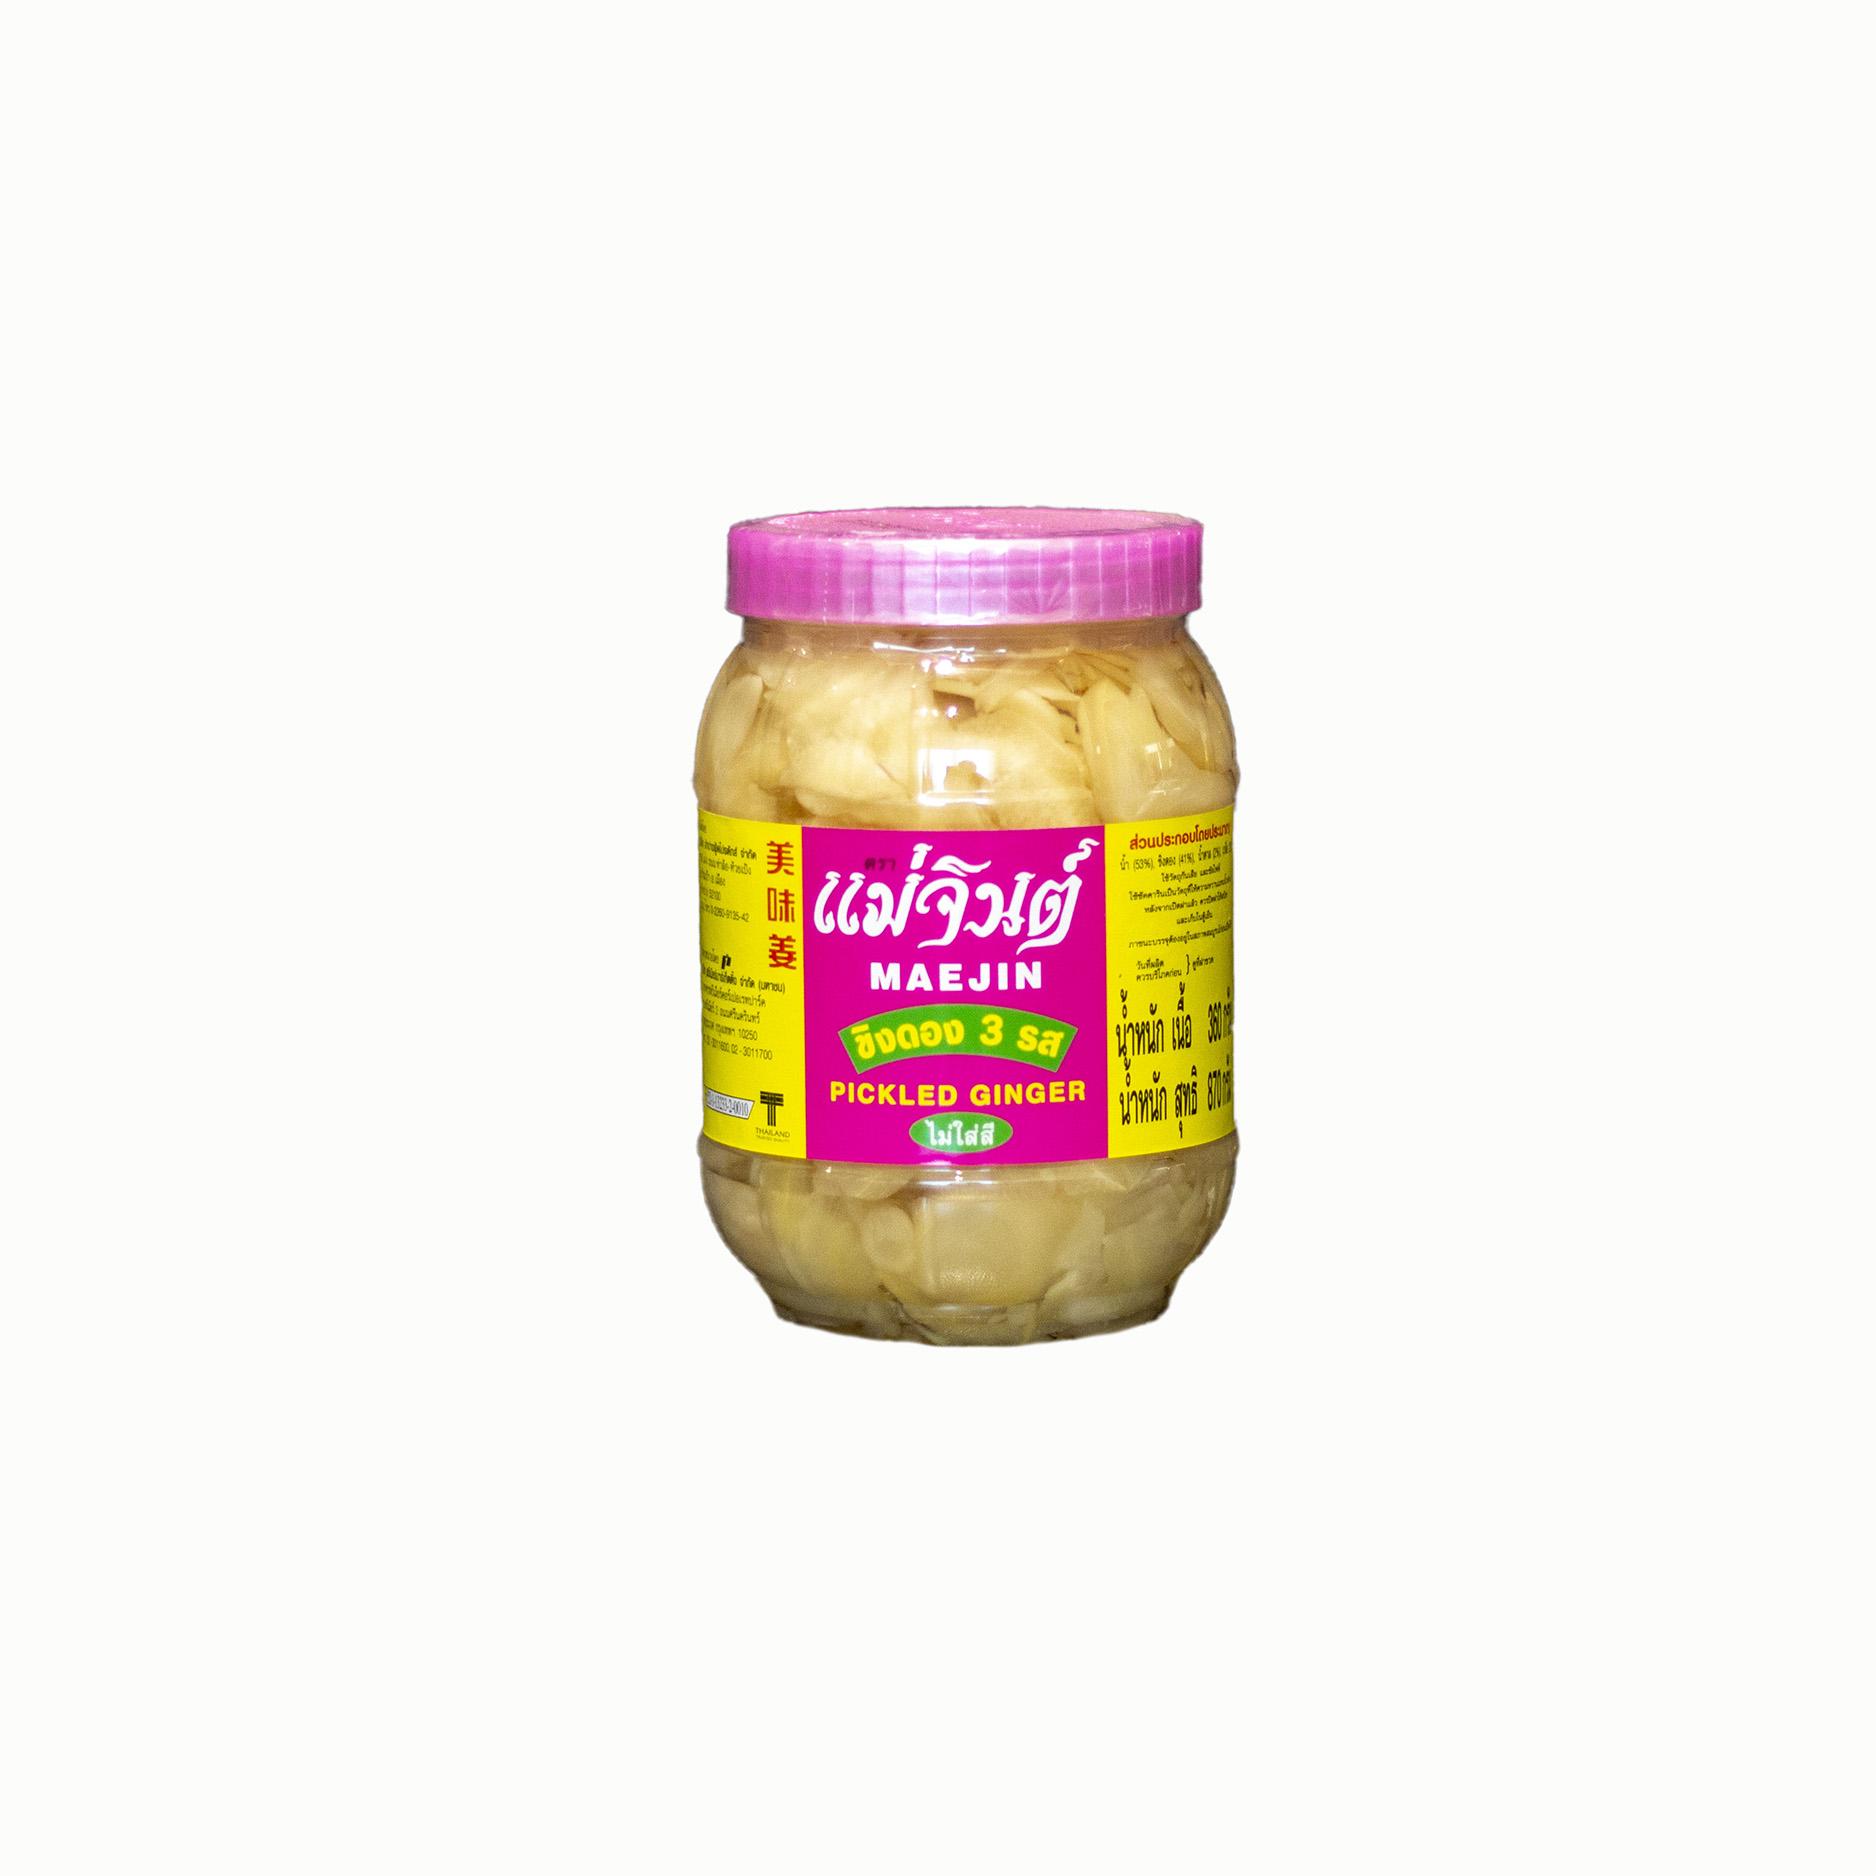 Maejin Pickled Ginger 870g 360g Dry Maxi International